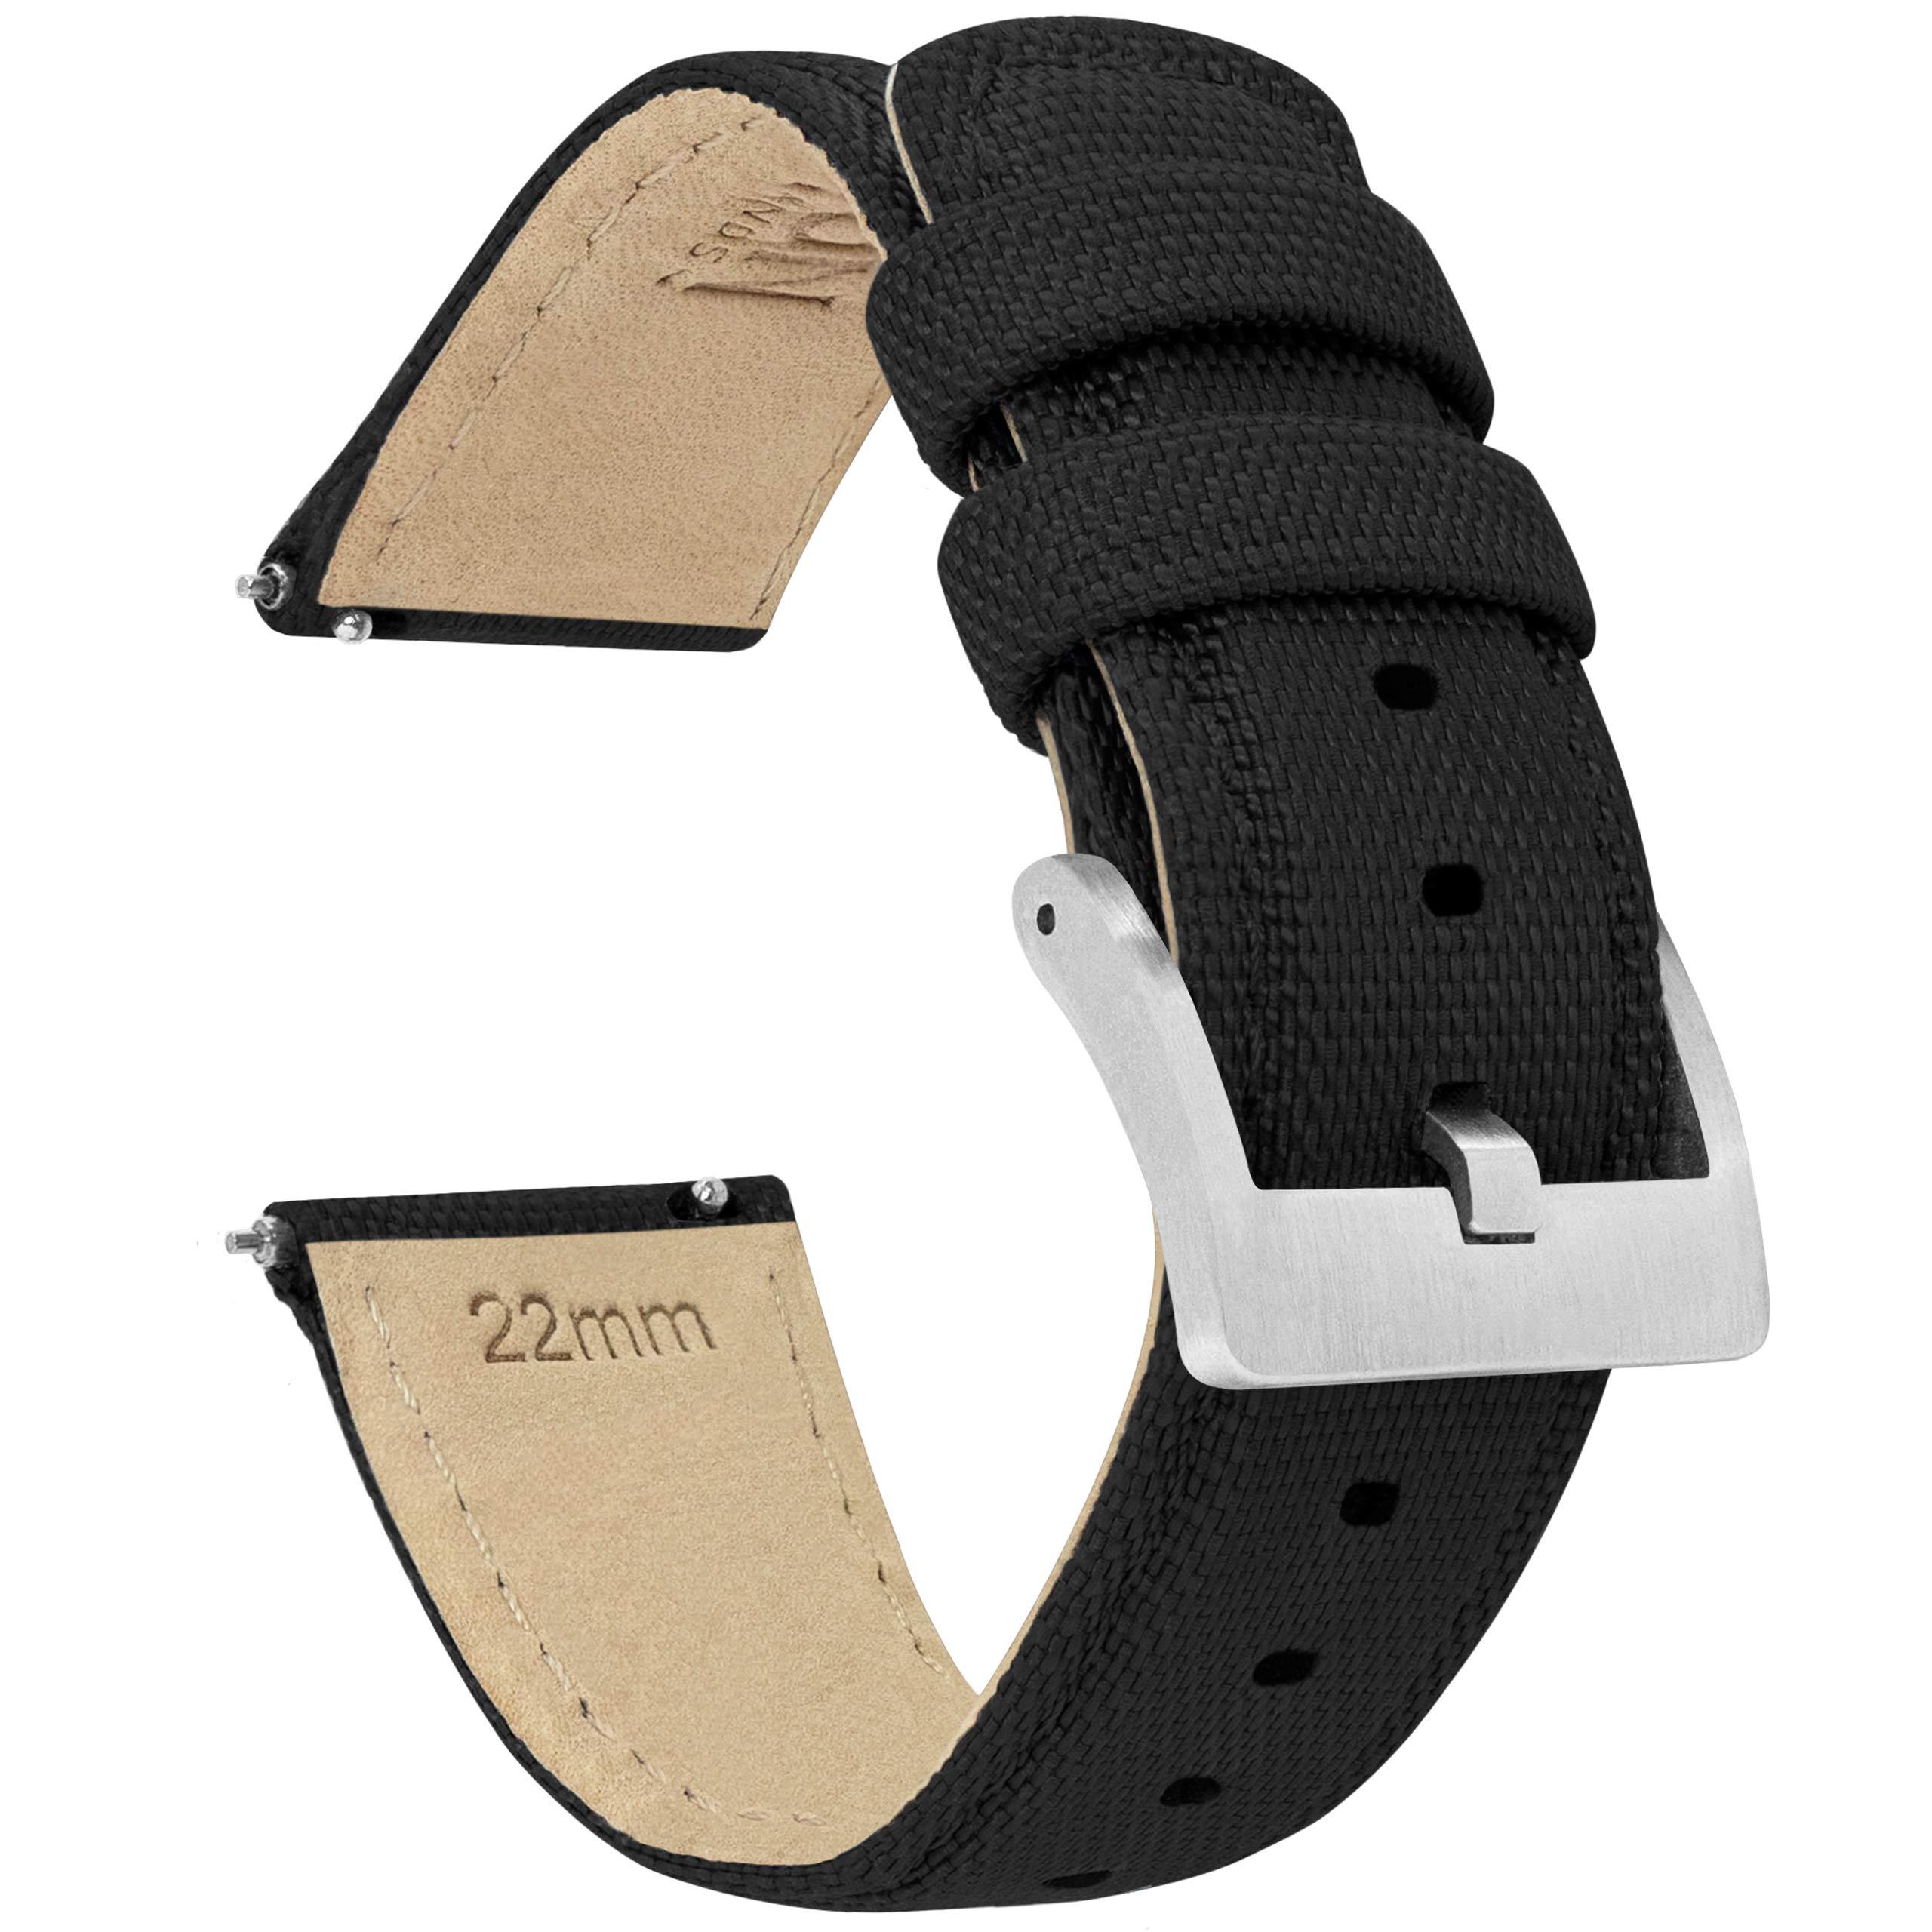 20mm Black - Barton Sailcloth Quick Release - Premium Nylon Weave by Barton Watch Bands